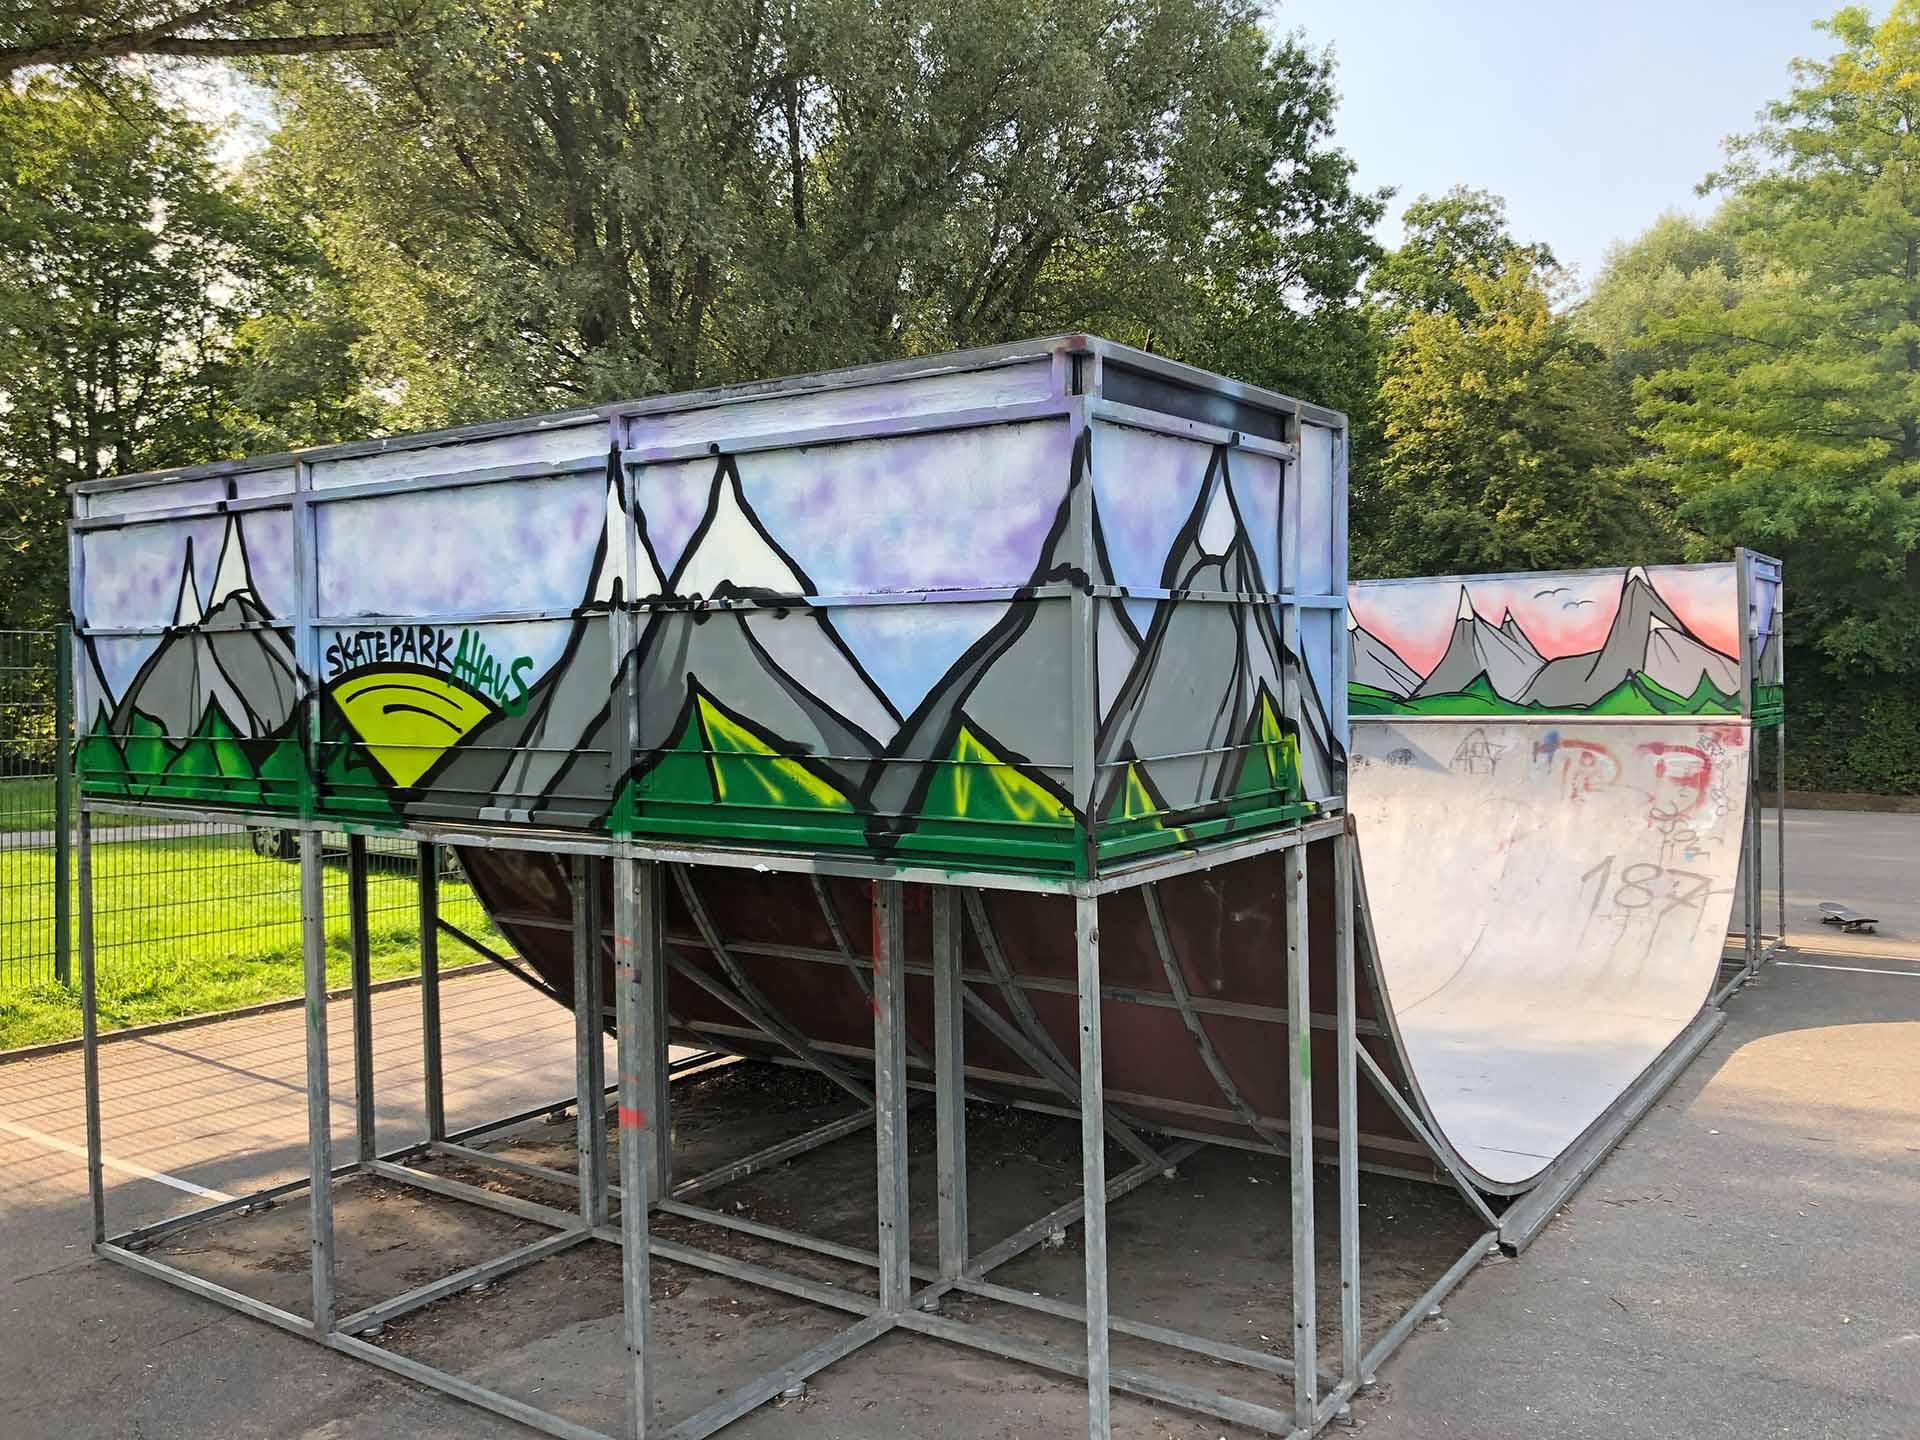 Graffiti-Workshop, Schule, Münster, Graffiti, Workshop, Sprayen, Aktion, Bennet Grüttner